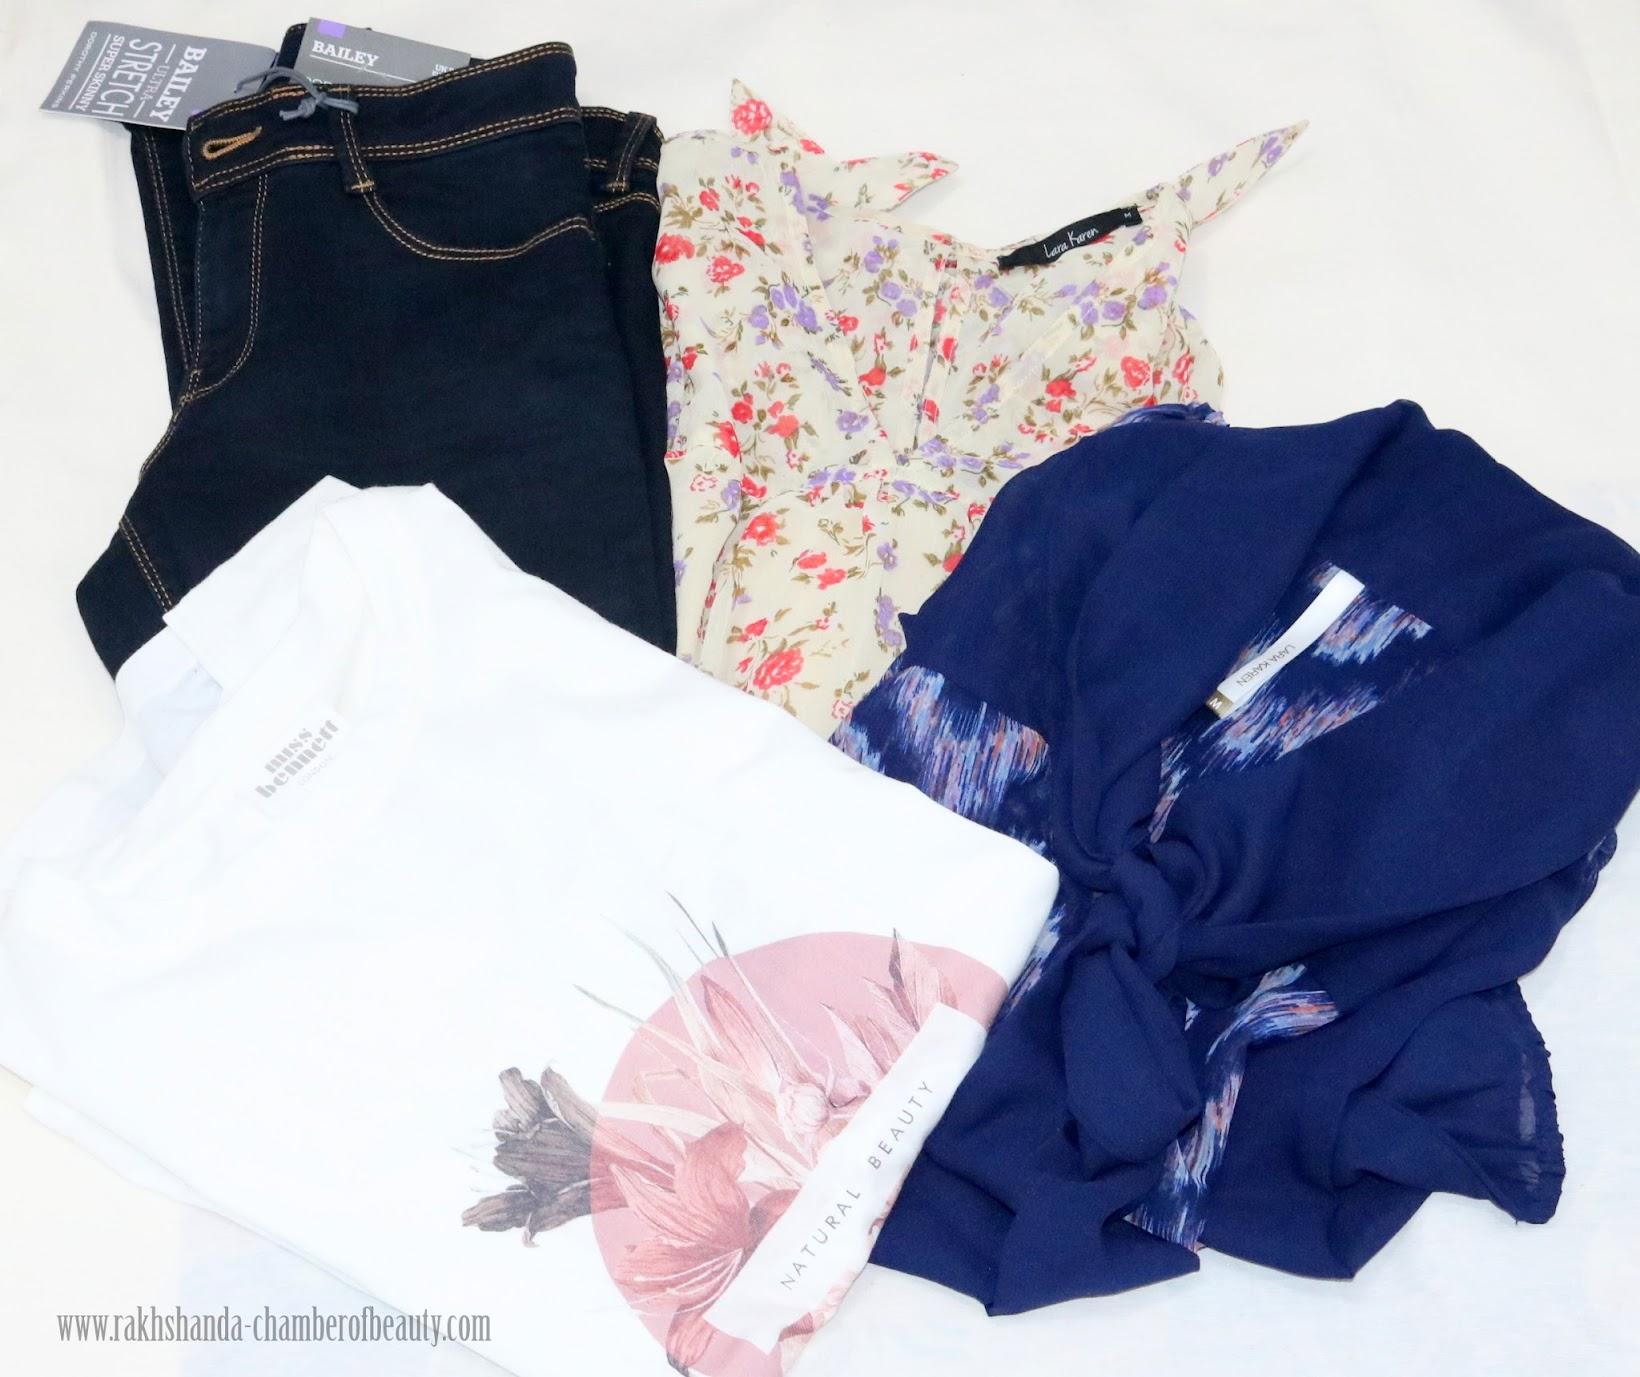 Jabong.com shopping experience, clothing haul from Jabong.com